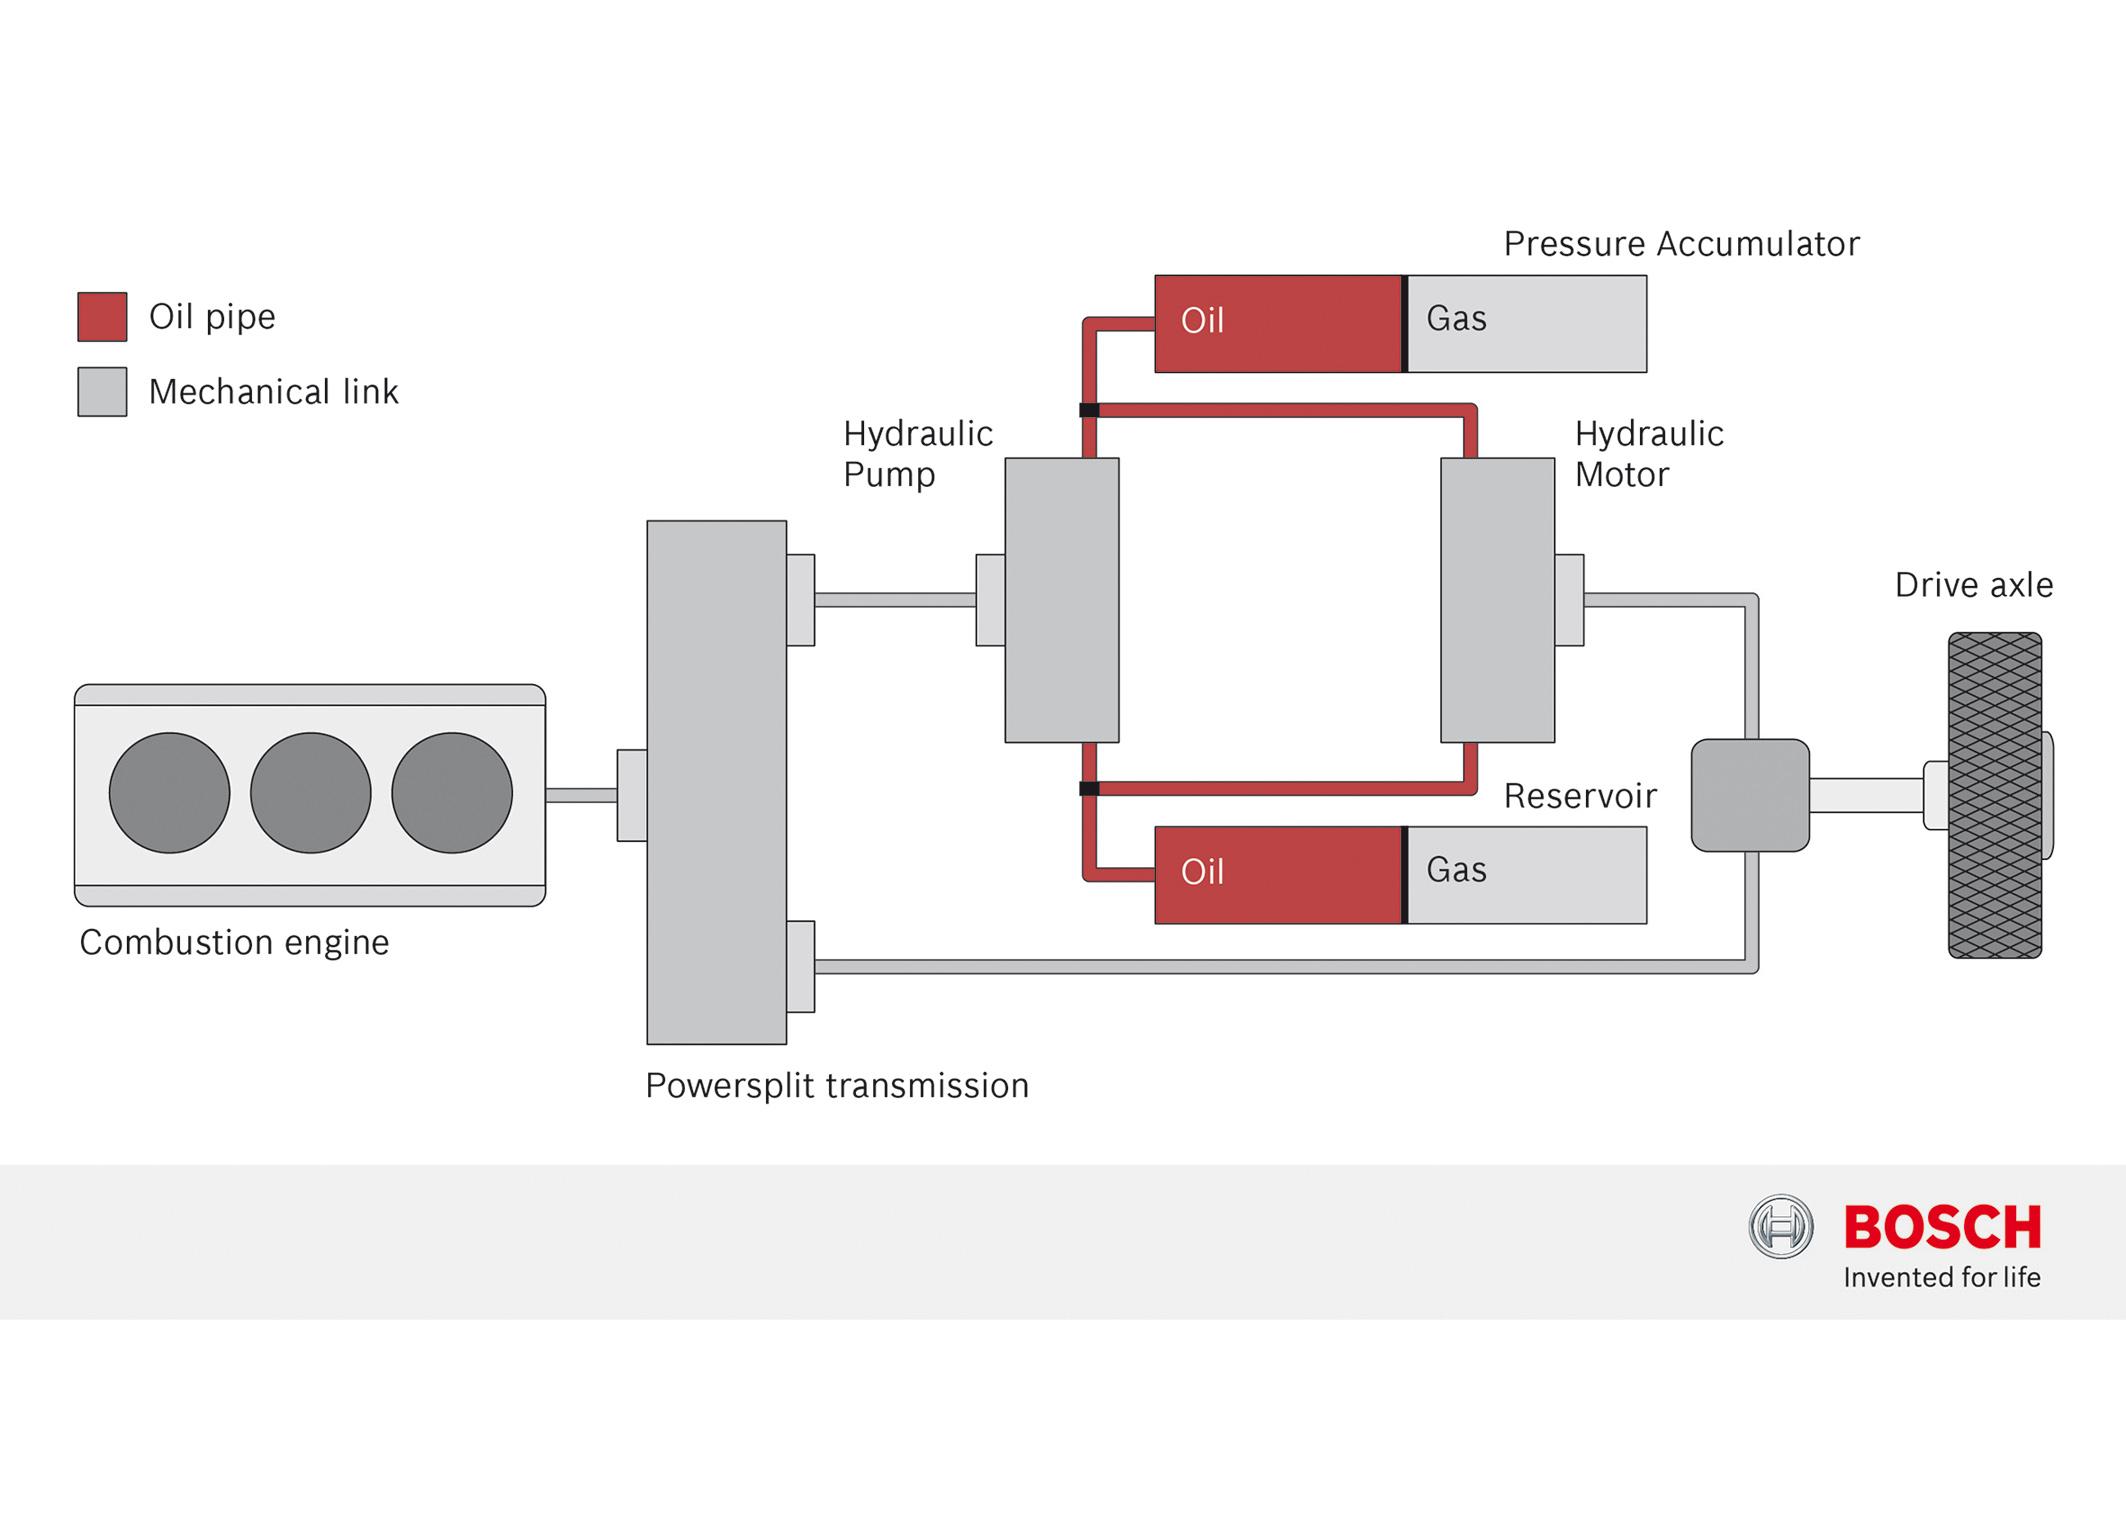 Schéma du système hybride hydraulique